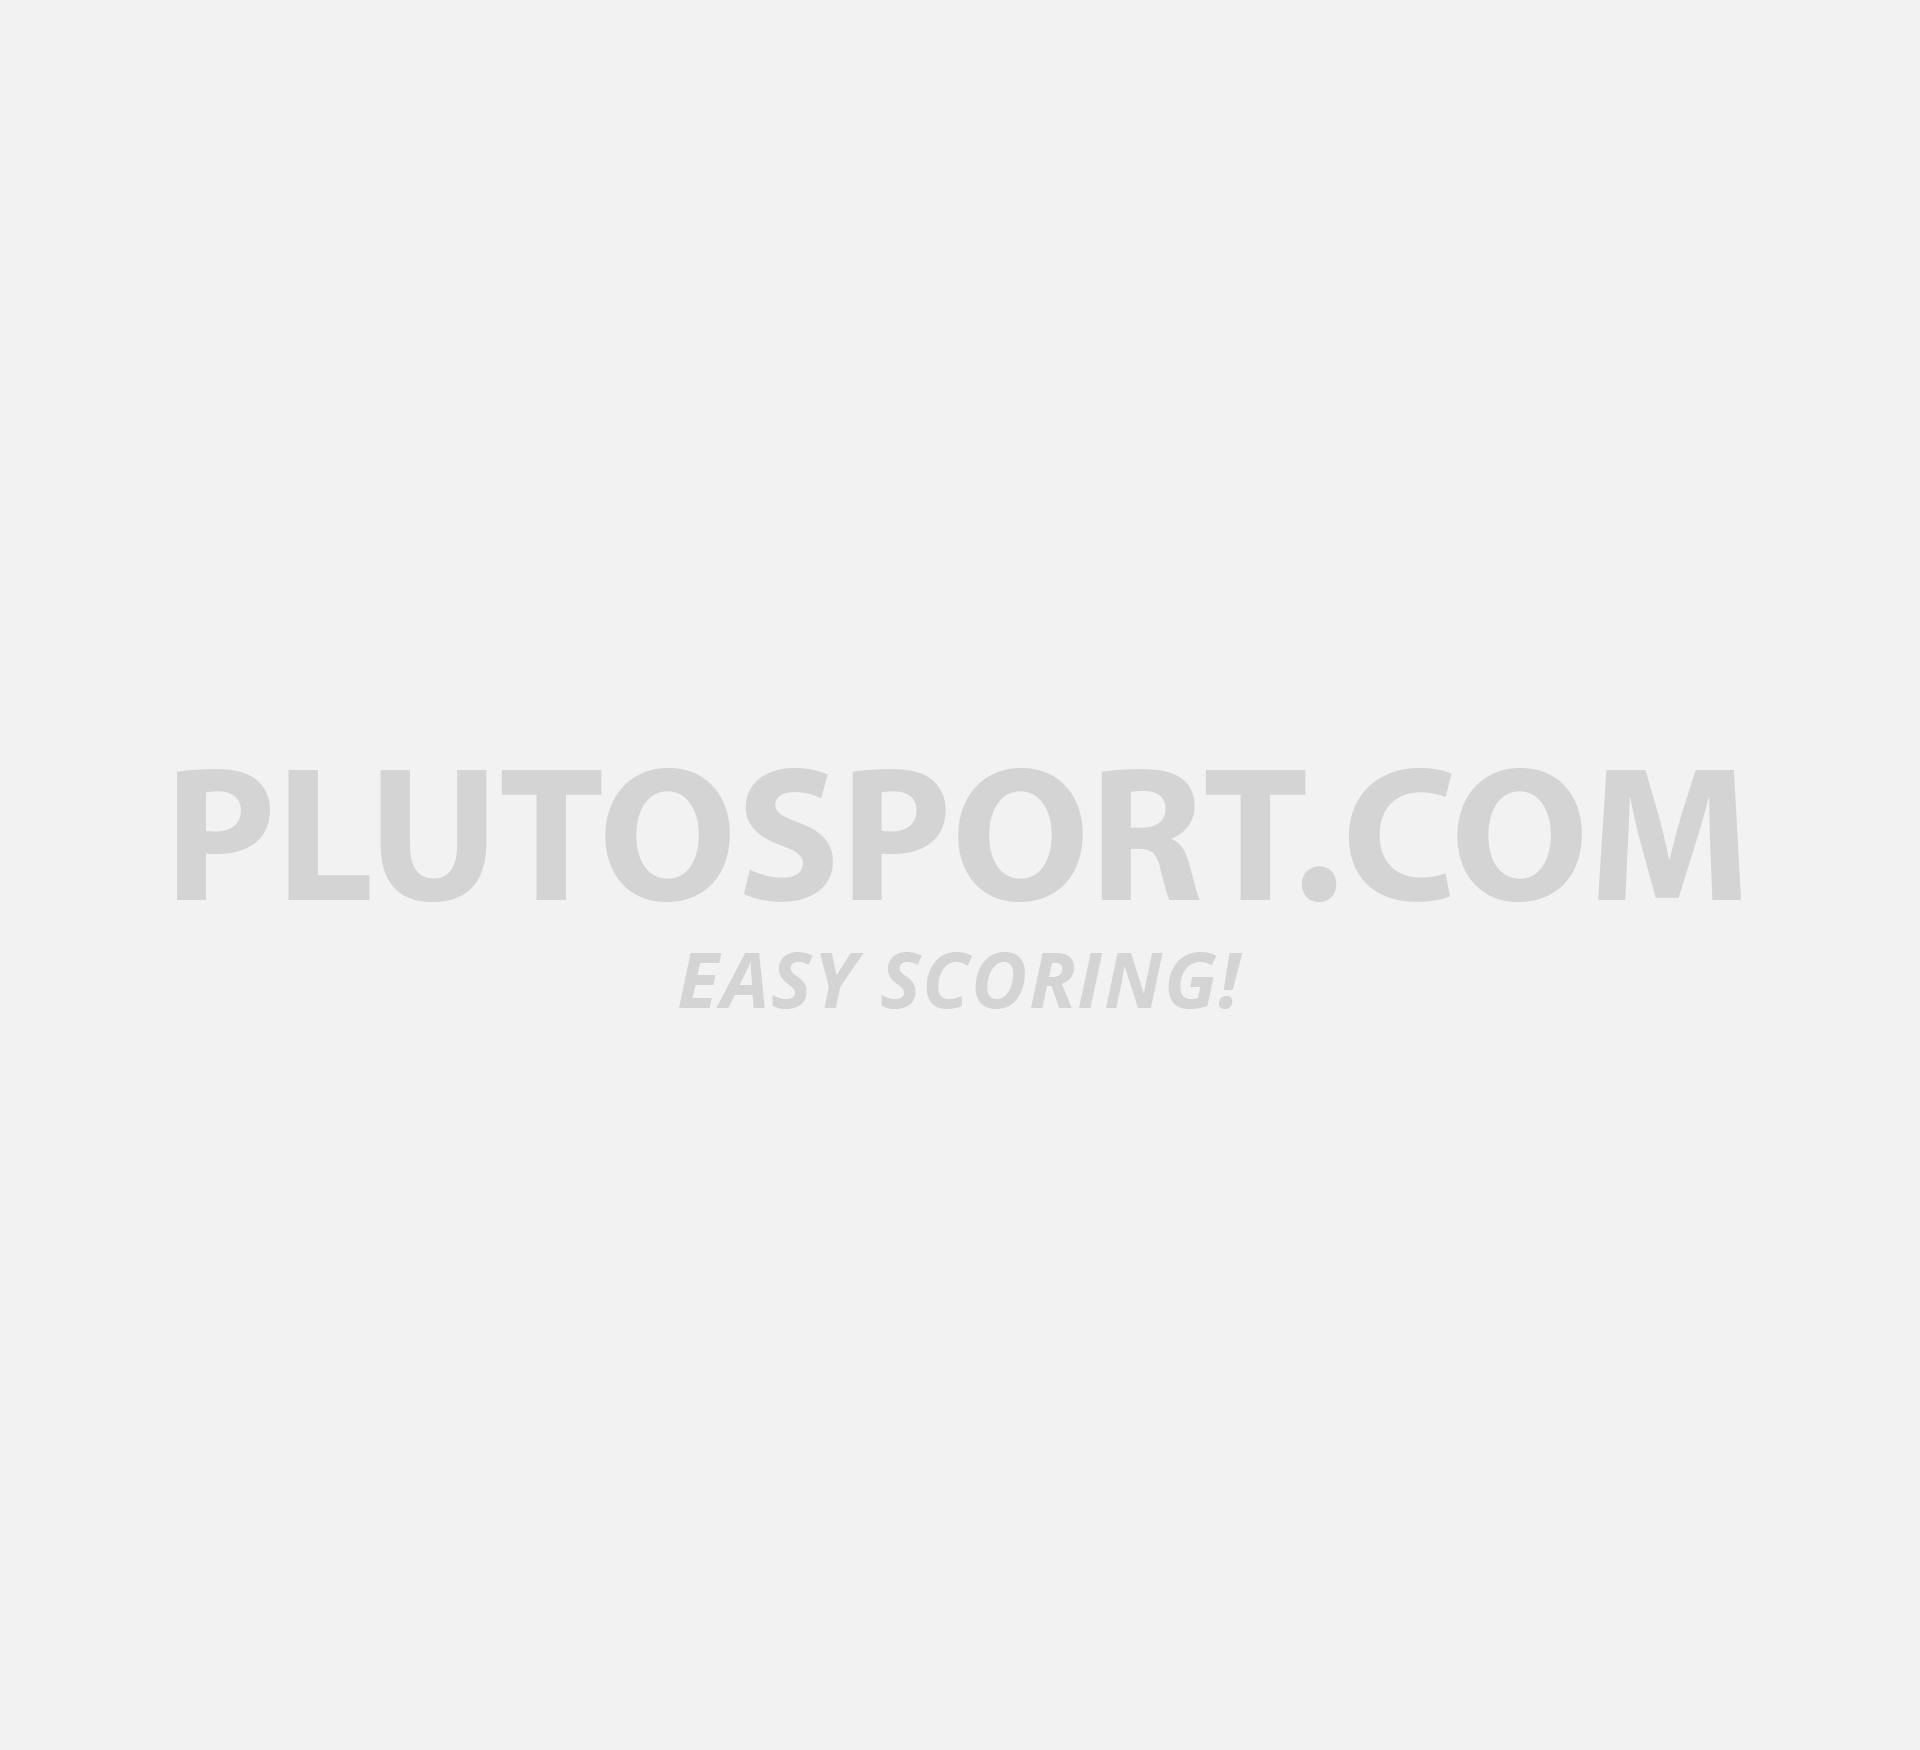 Arrugas Acechar quiero  Nike N45 Brushed Fleece Cuffed Pant Junior - Sweat - Pants - Clothing -  Lifestyle - Sports | Plutosport